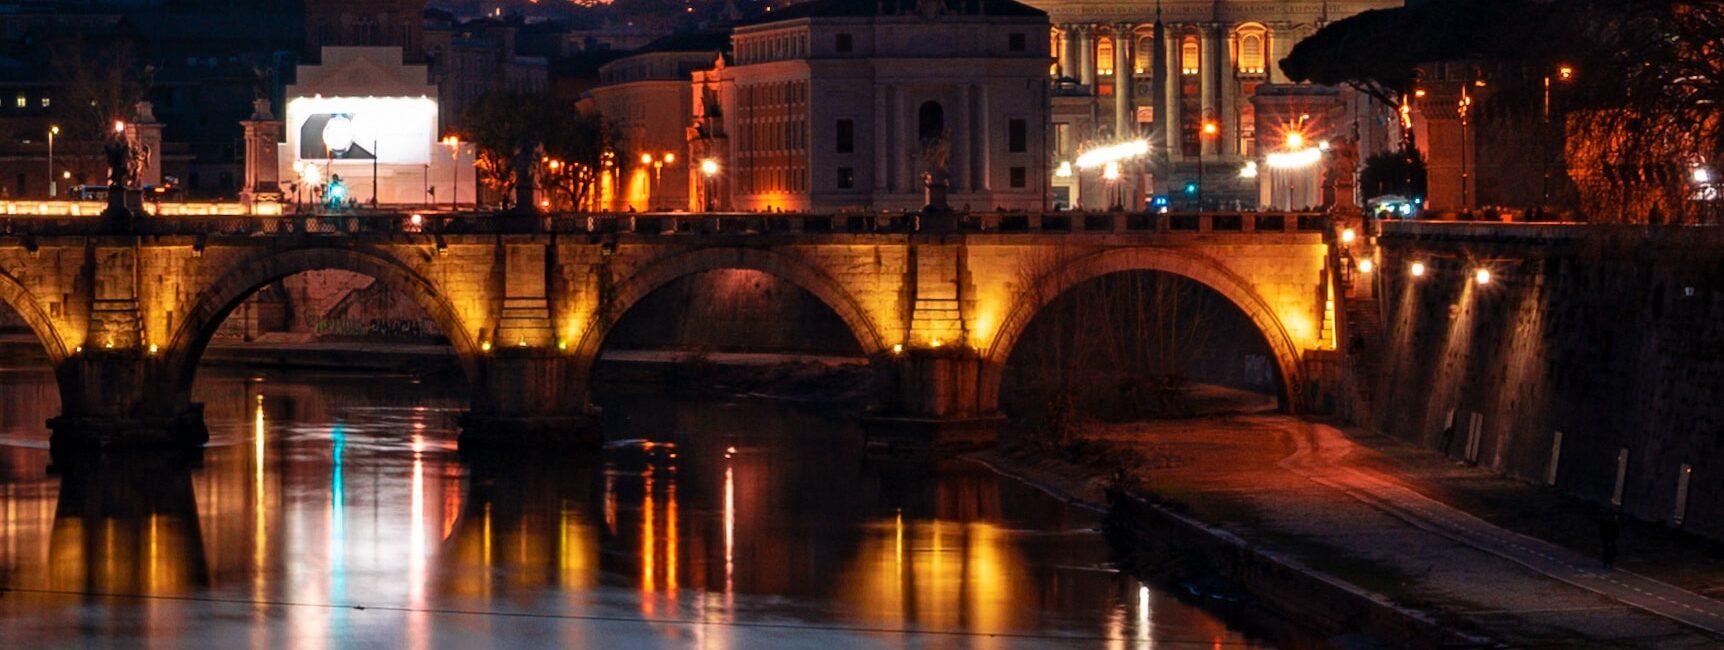 Top three contemporary art destinations in Rome